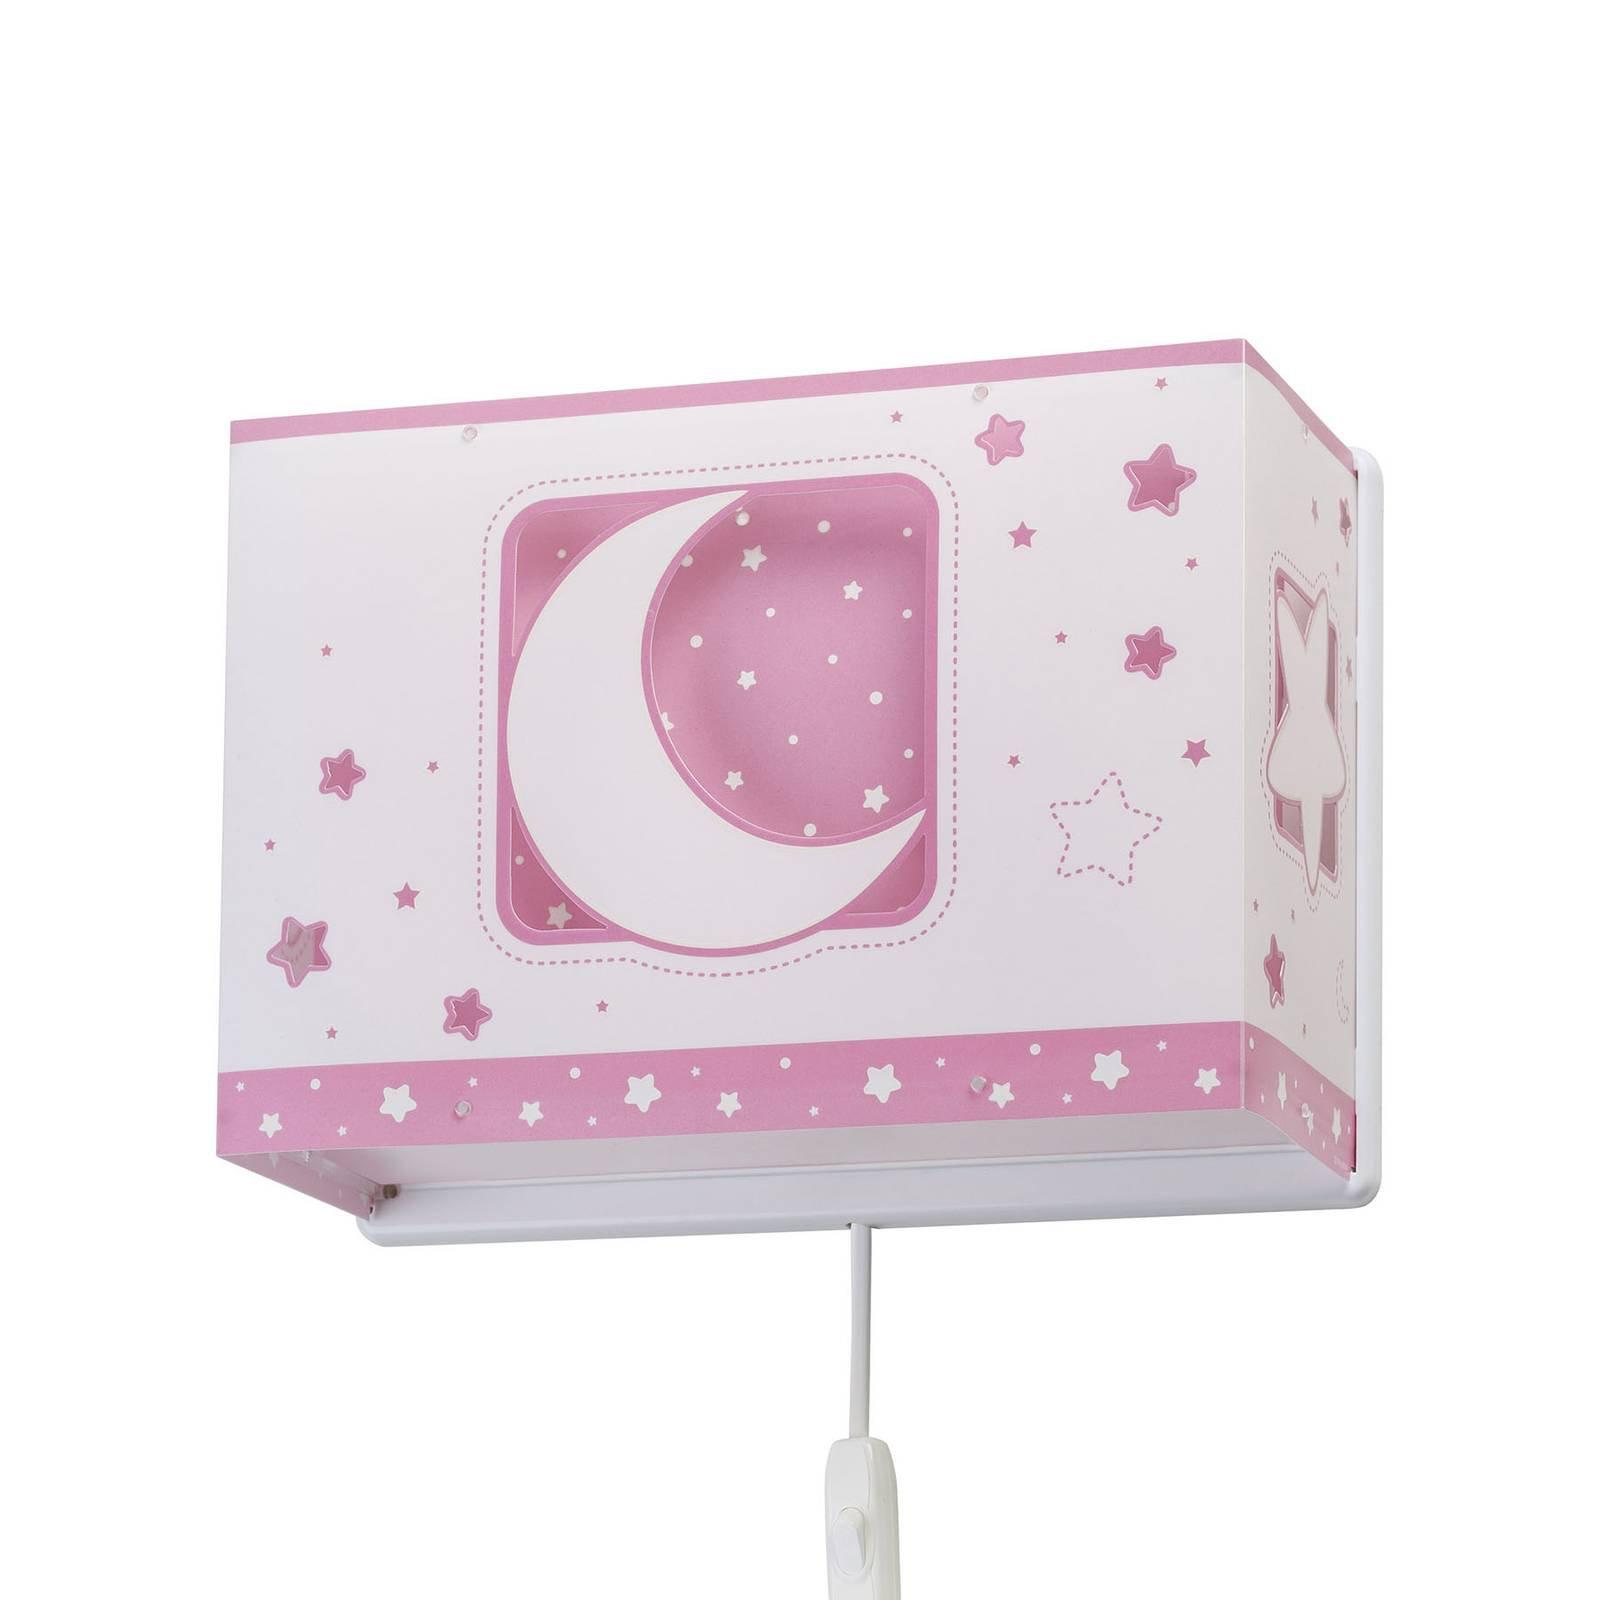 Pendellampe til barnerom Moonlight med plugg, rosa